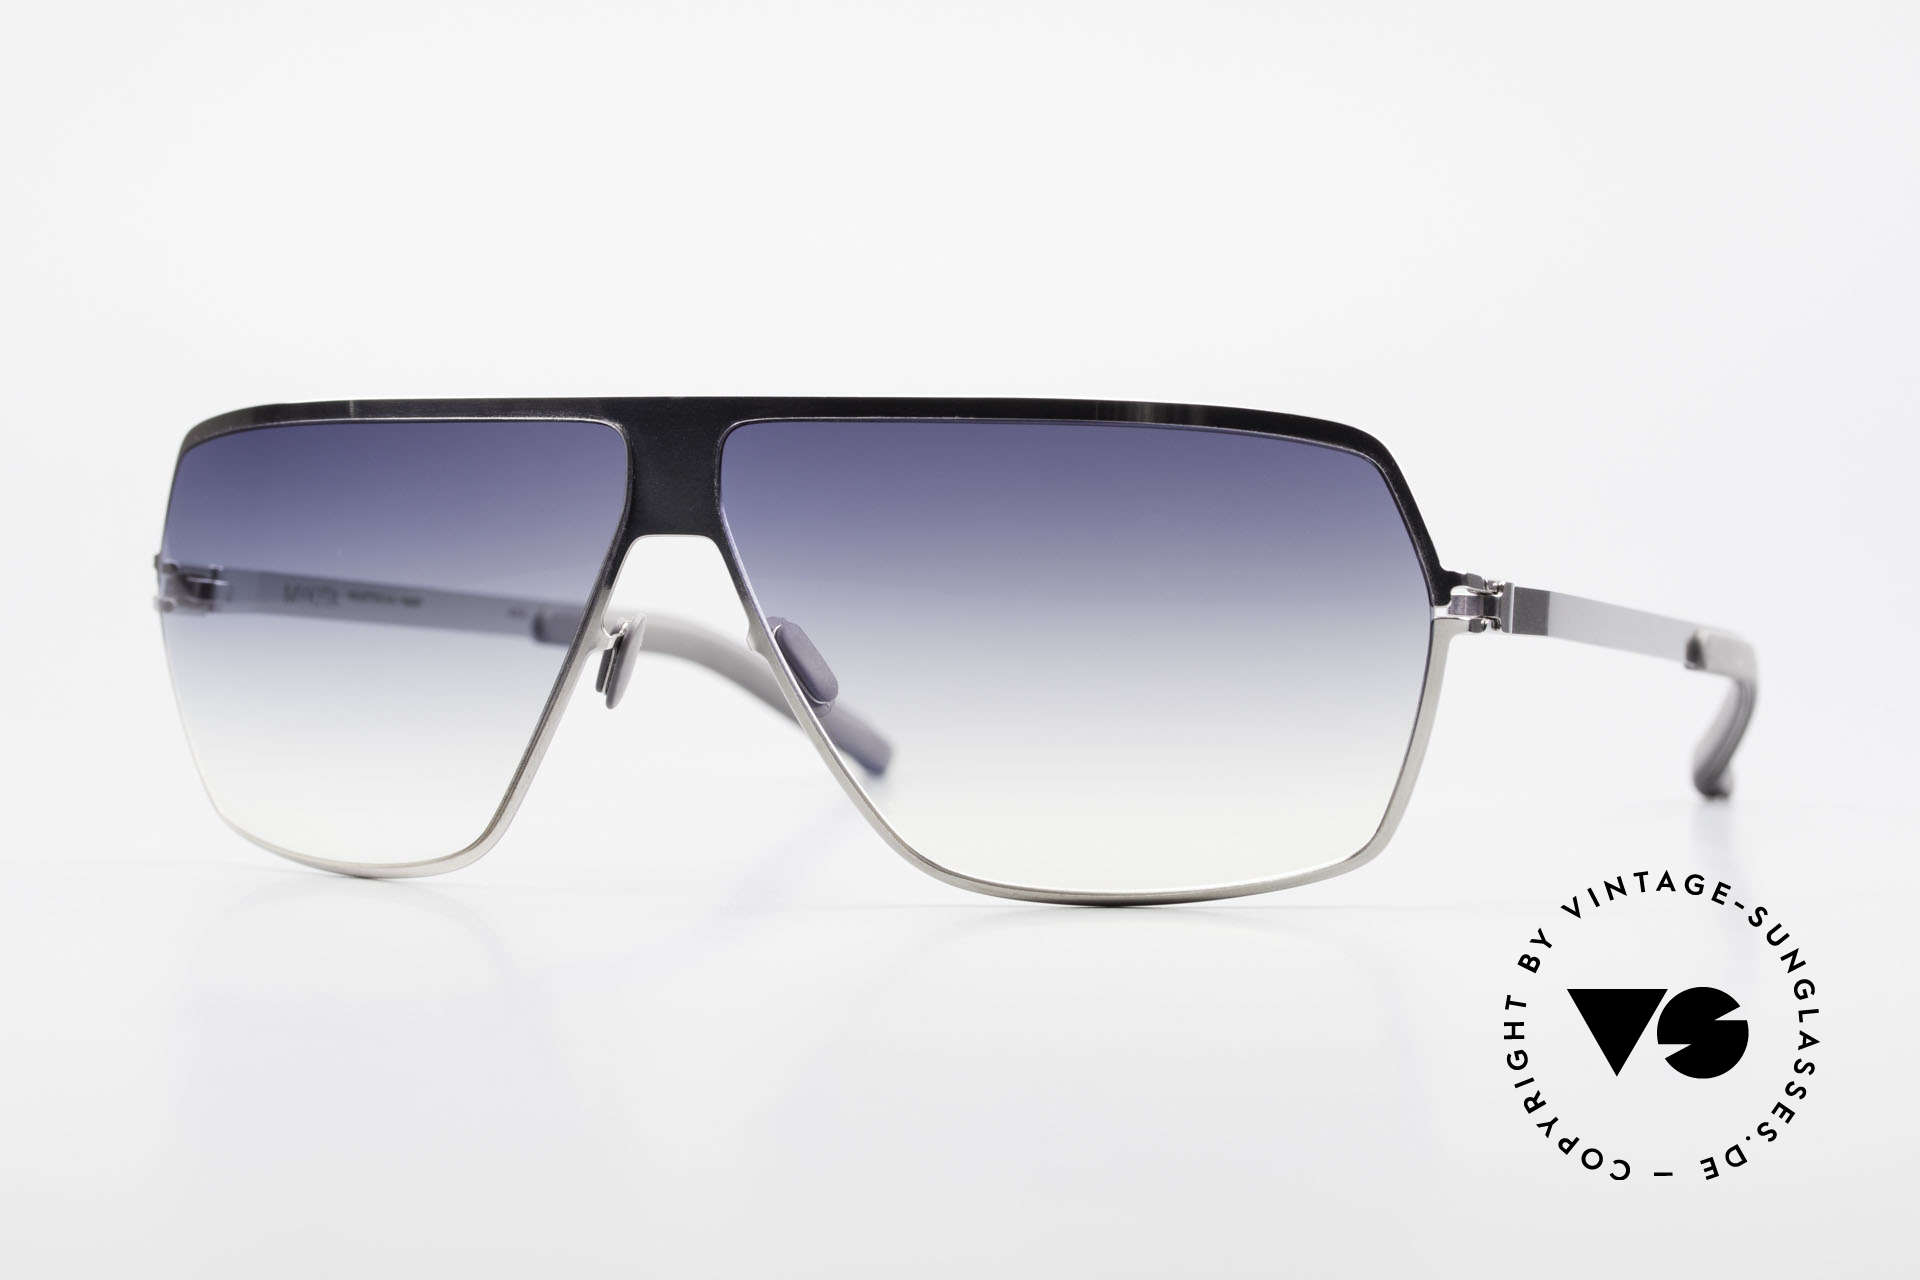 Mykita Rock No1 Designer Sunglasses 2009, original VINTAGE MYKITA men's sunglasses from 2009, Made for Men